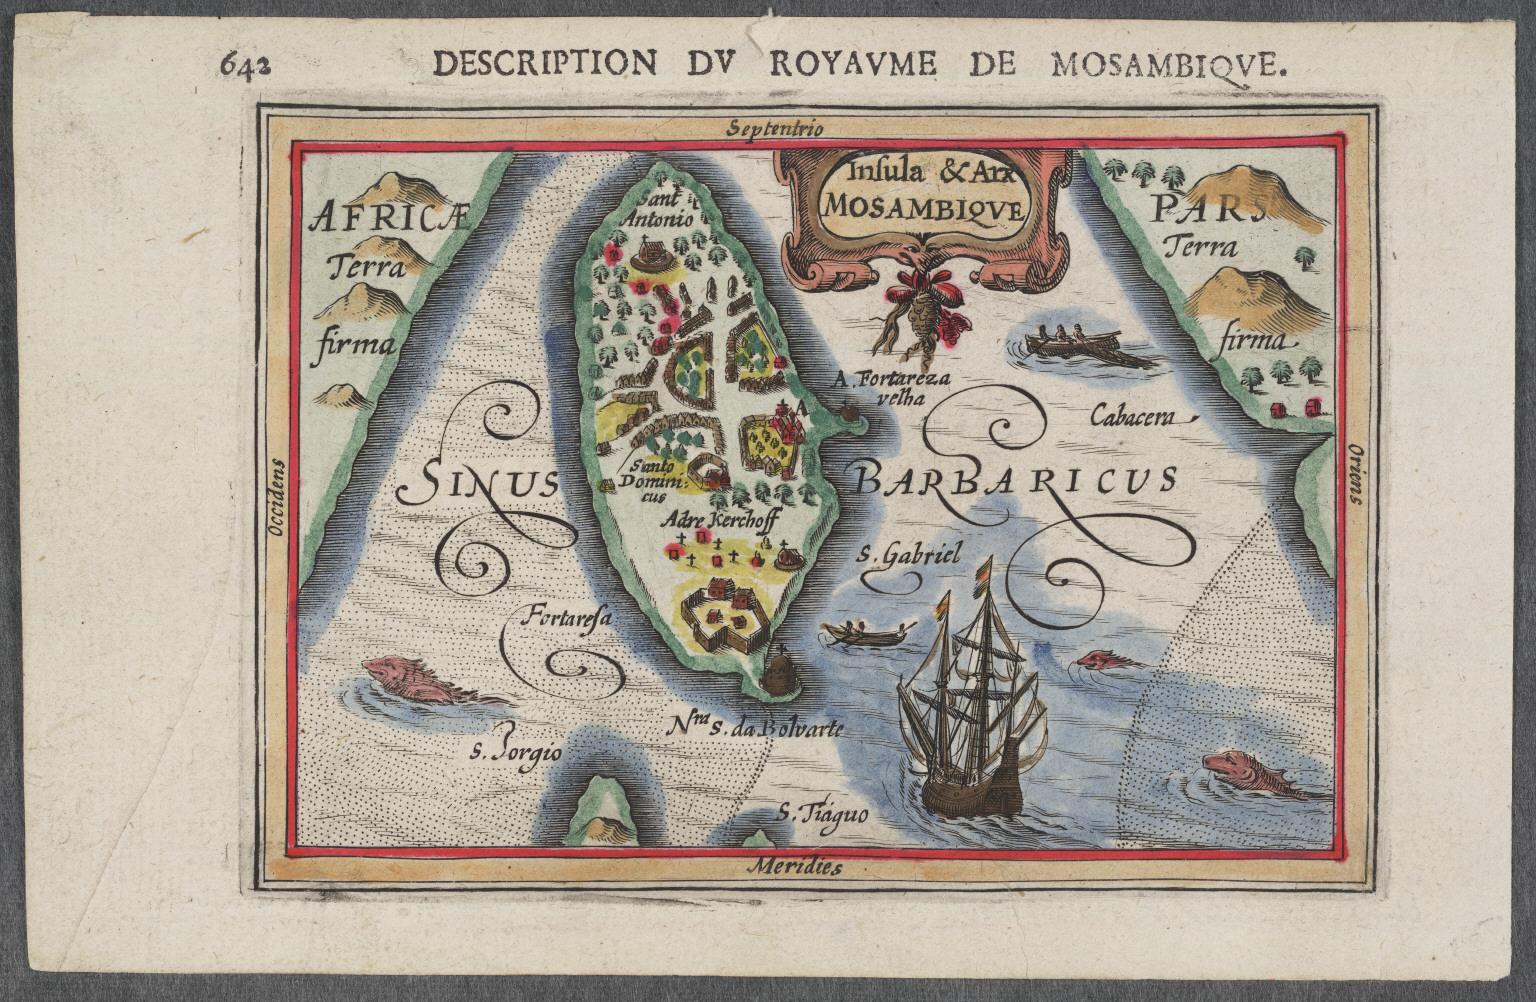 Insula and Arx Mozambique.